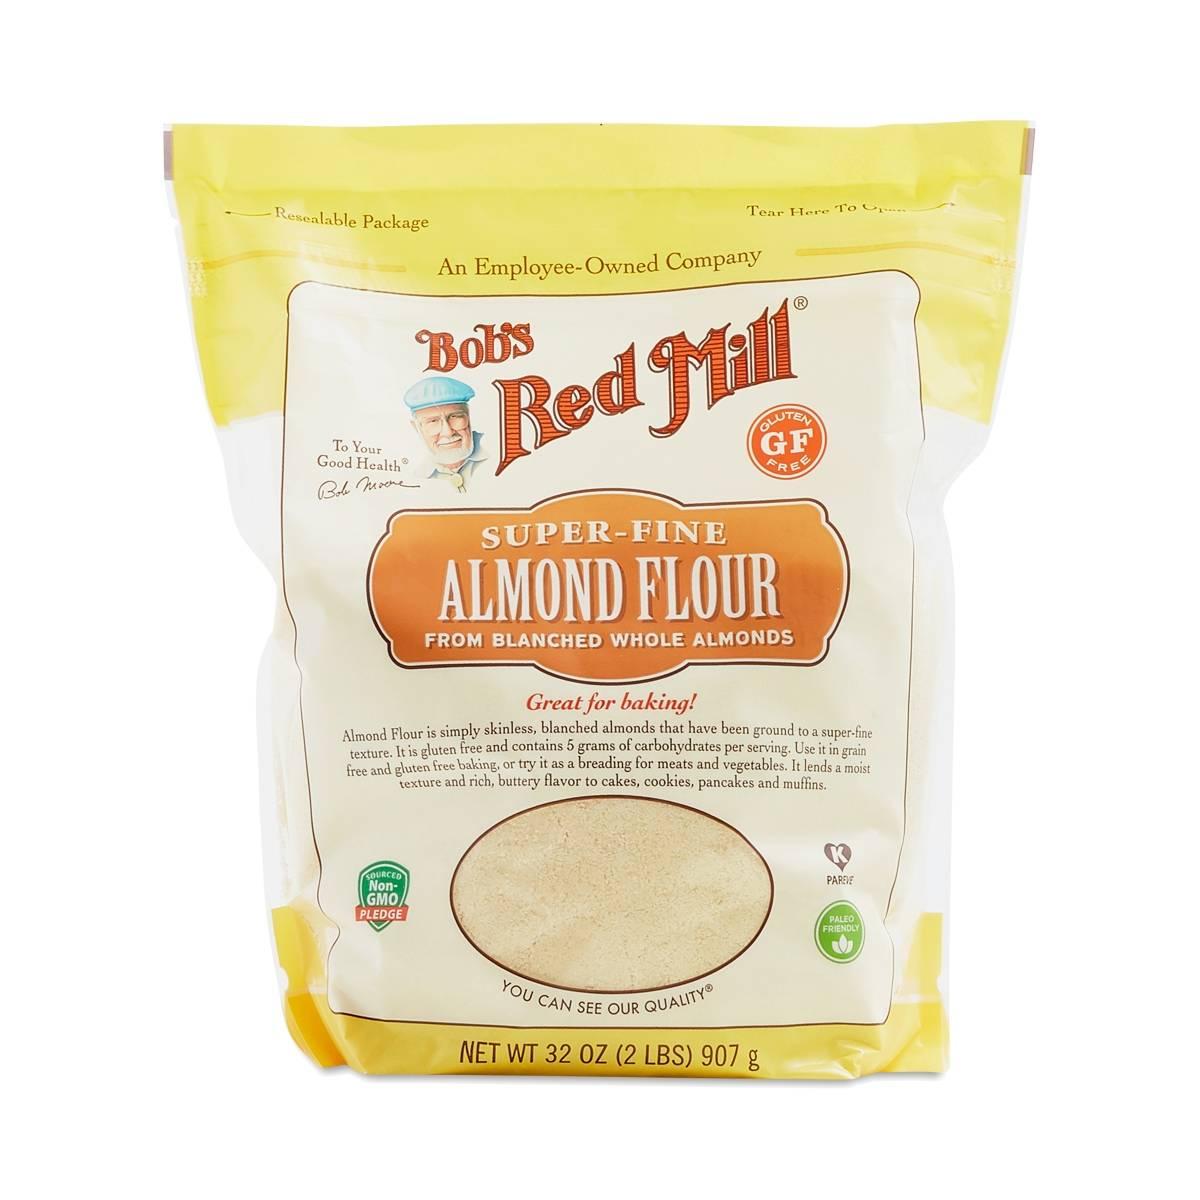 Bob's Red Mill Super-Fine Almond Flour - Thrive Market